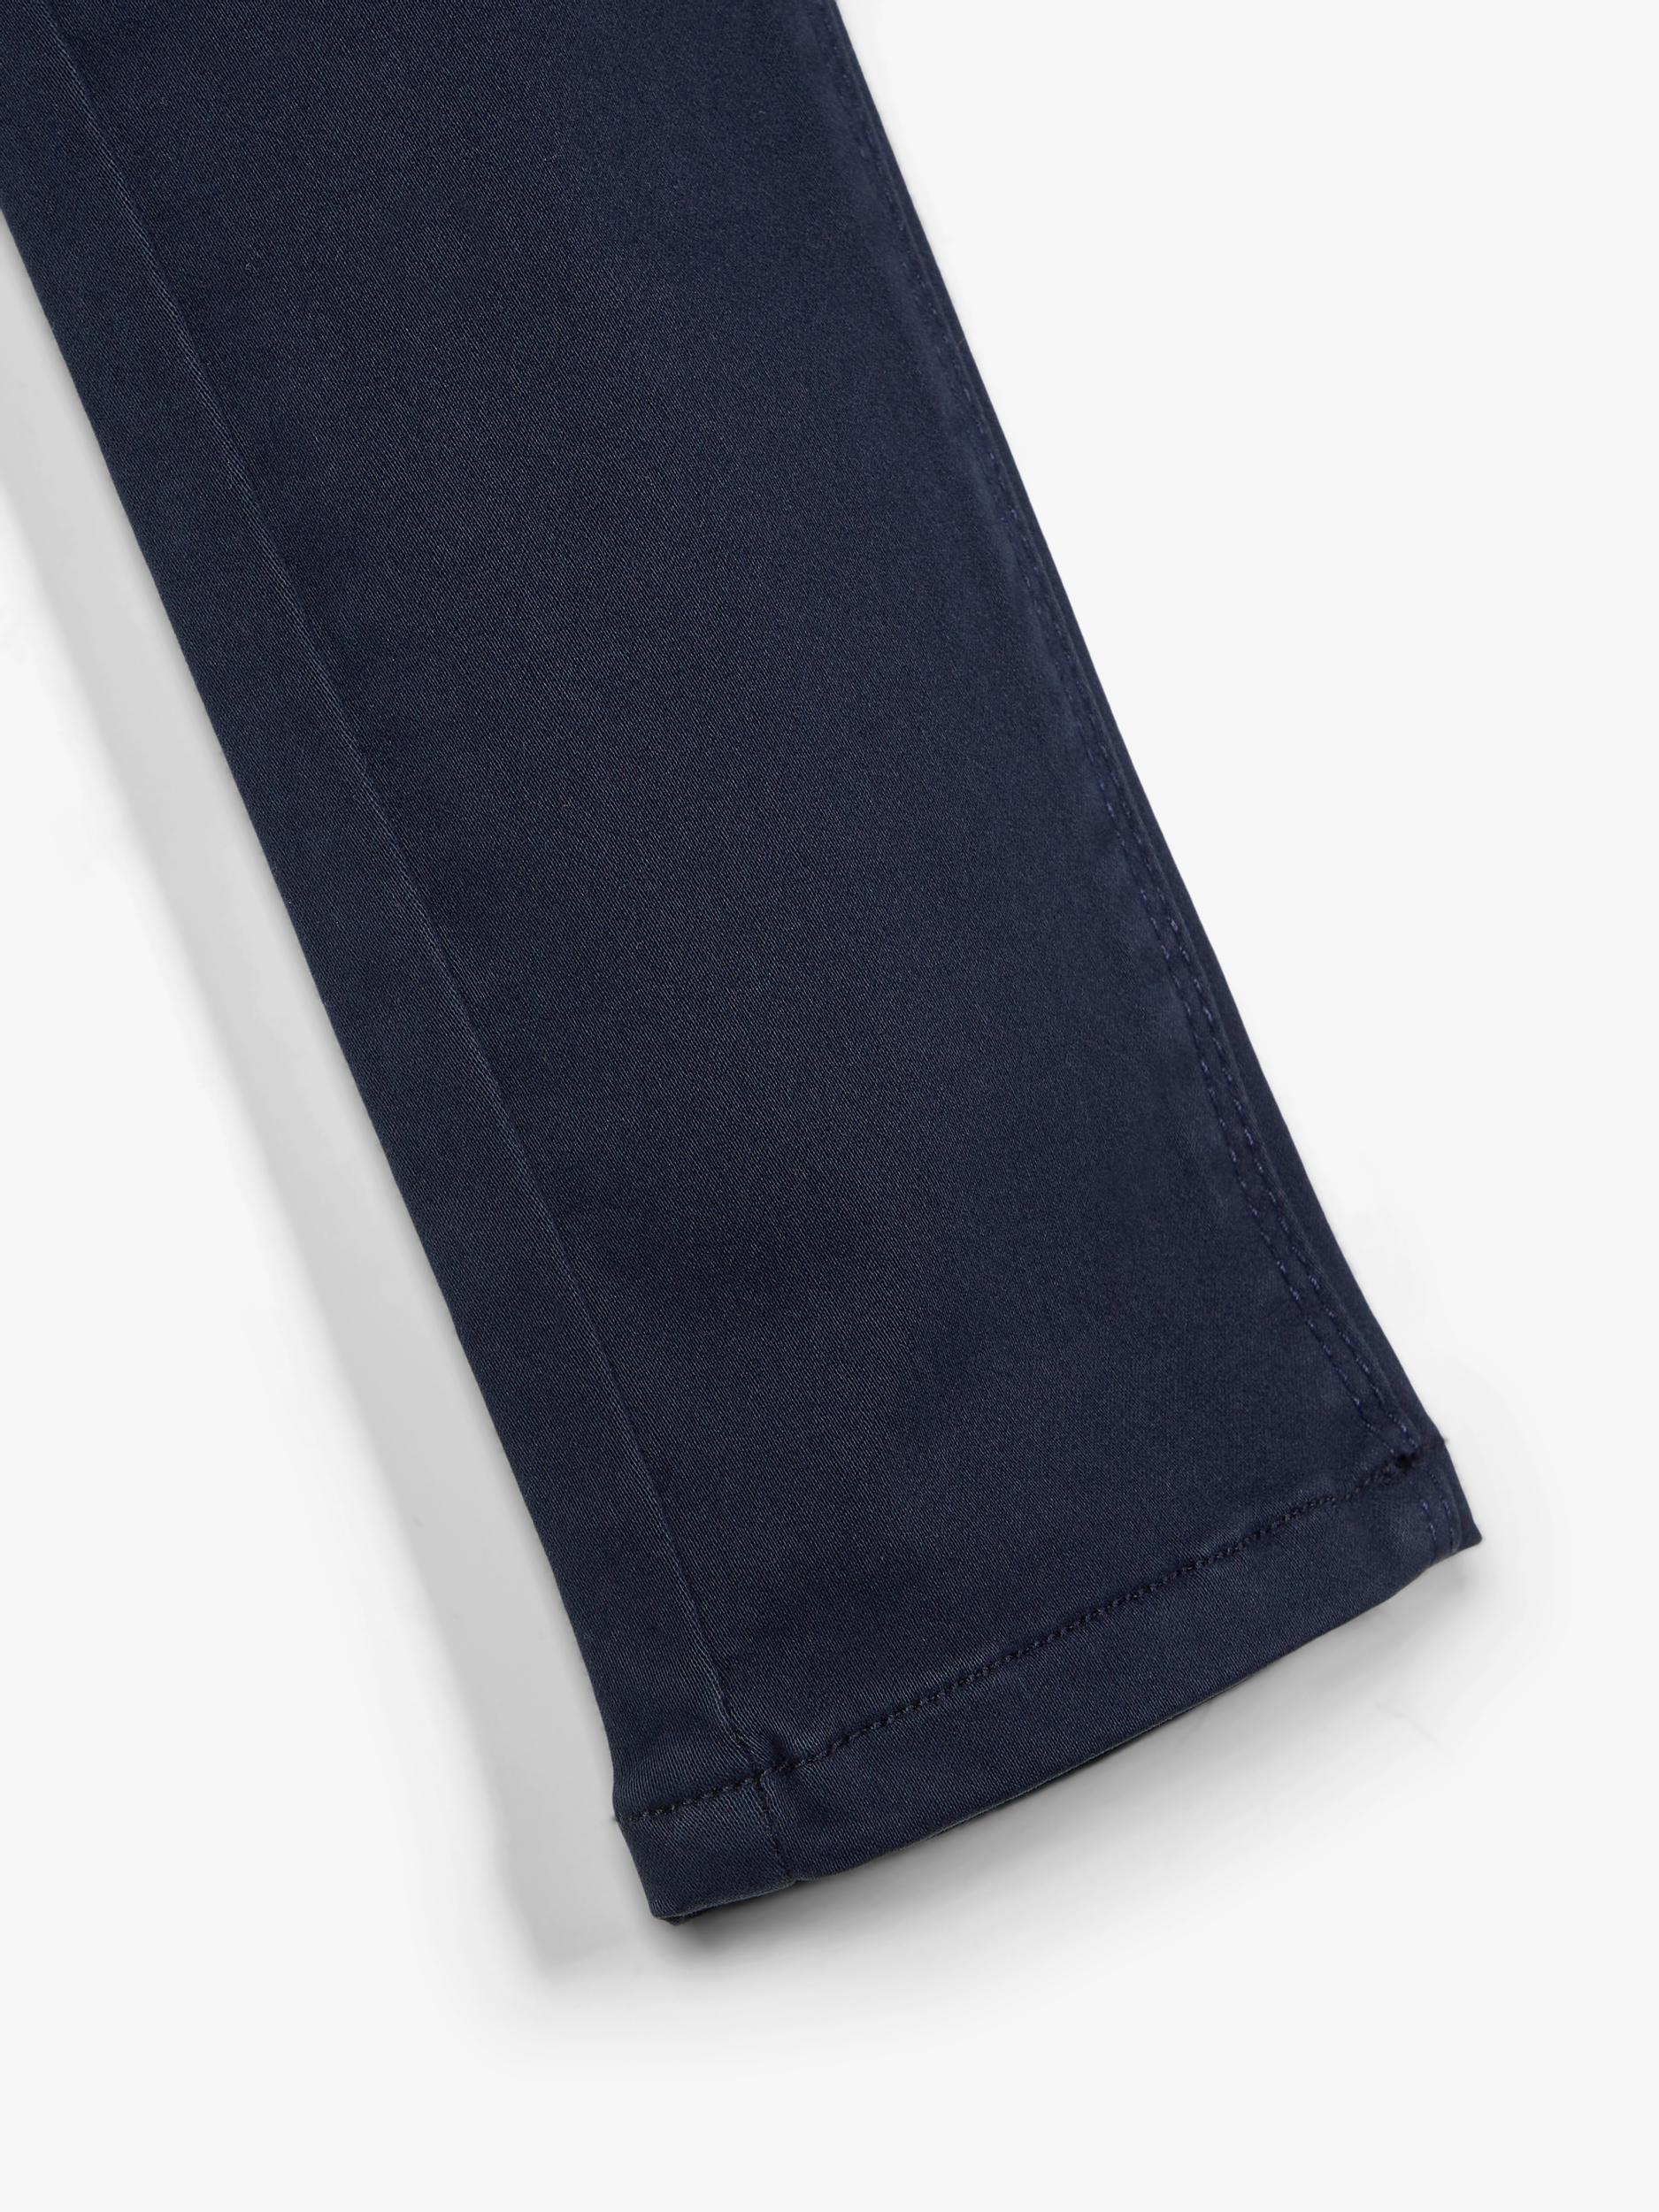 Name It Polly leggings, dark sapphire, 128